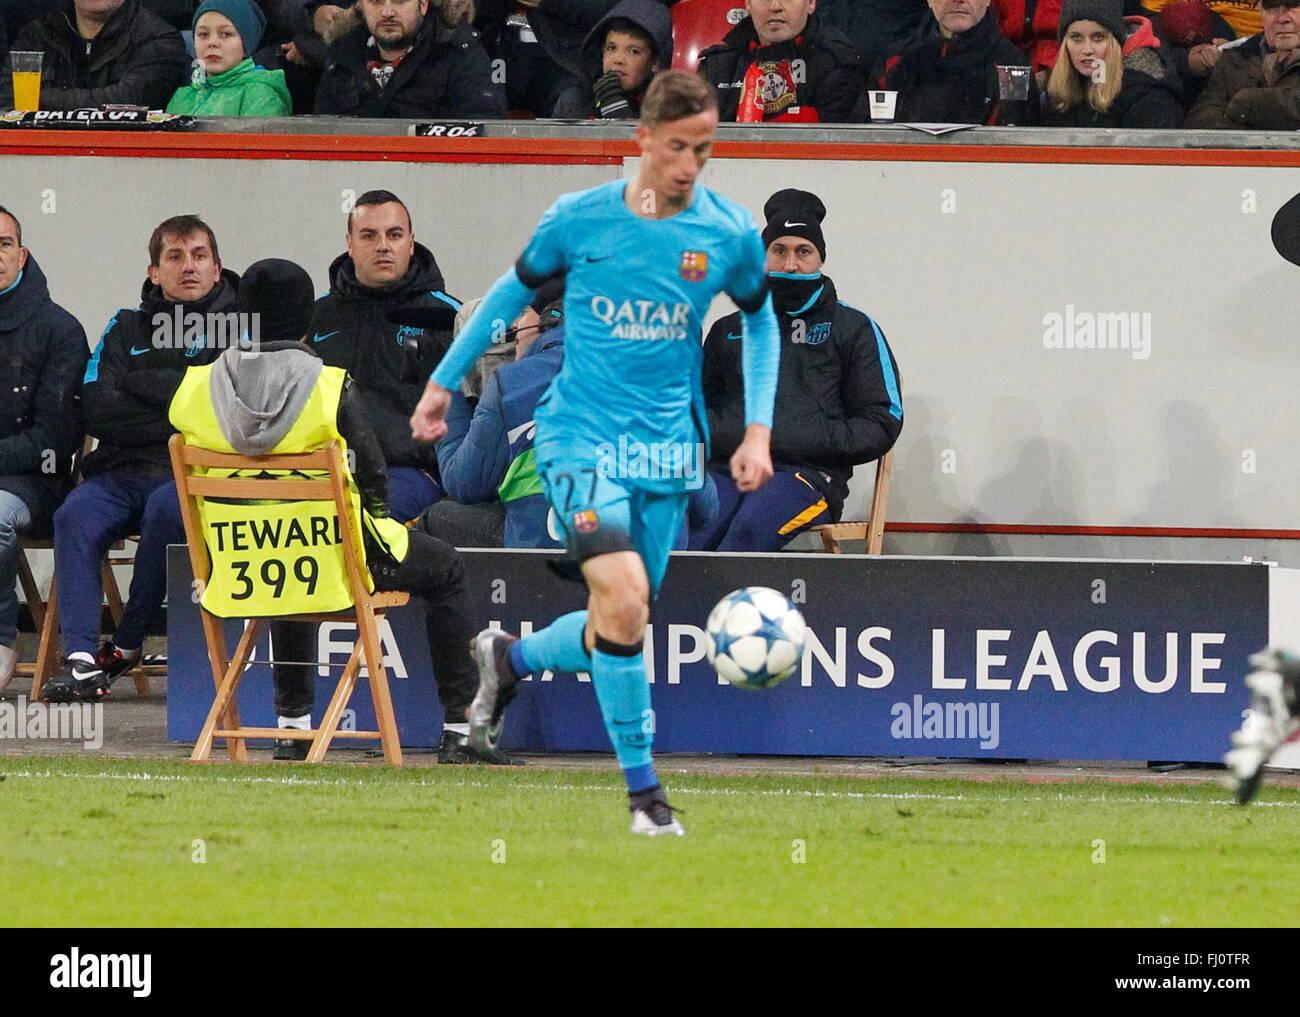 Juan Cámara during the champion league match Bayer Leverkusen - FC Barcelona December 9, 2015 in the Bay Arena,Leverkusen, - Stock Image